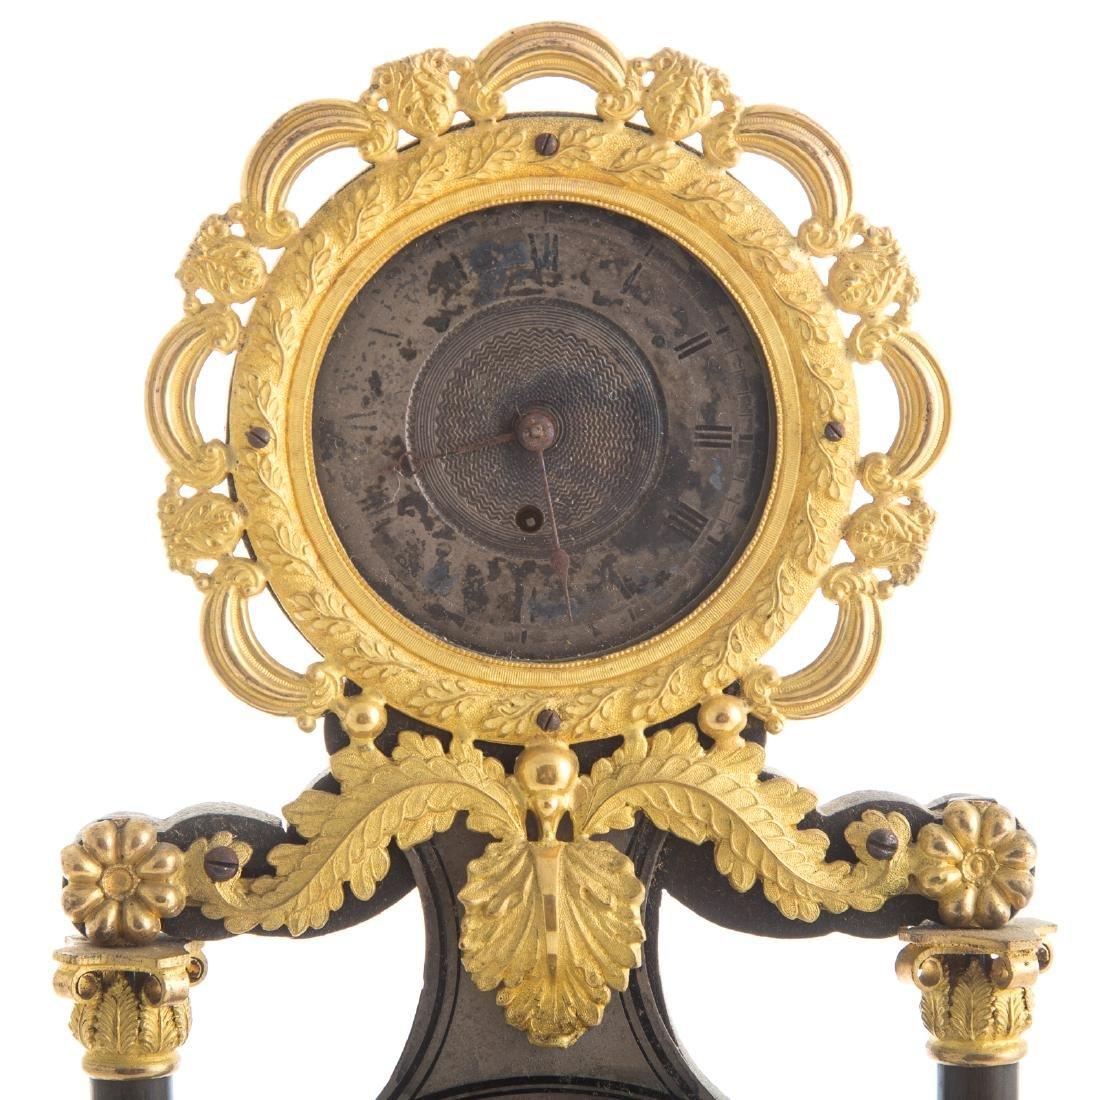 French Empire mantel clock - 3